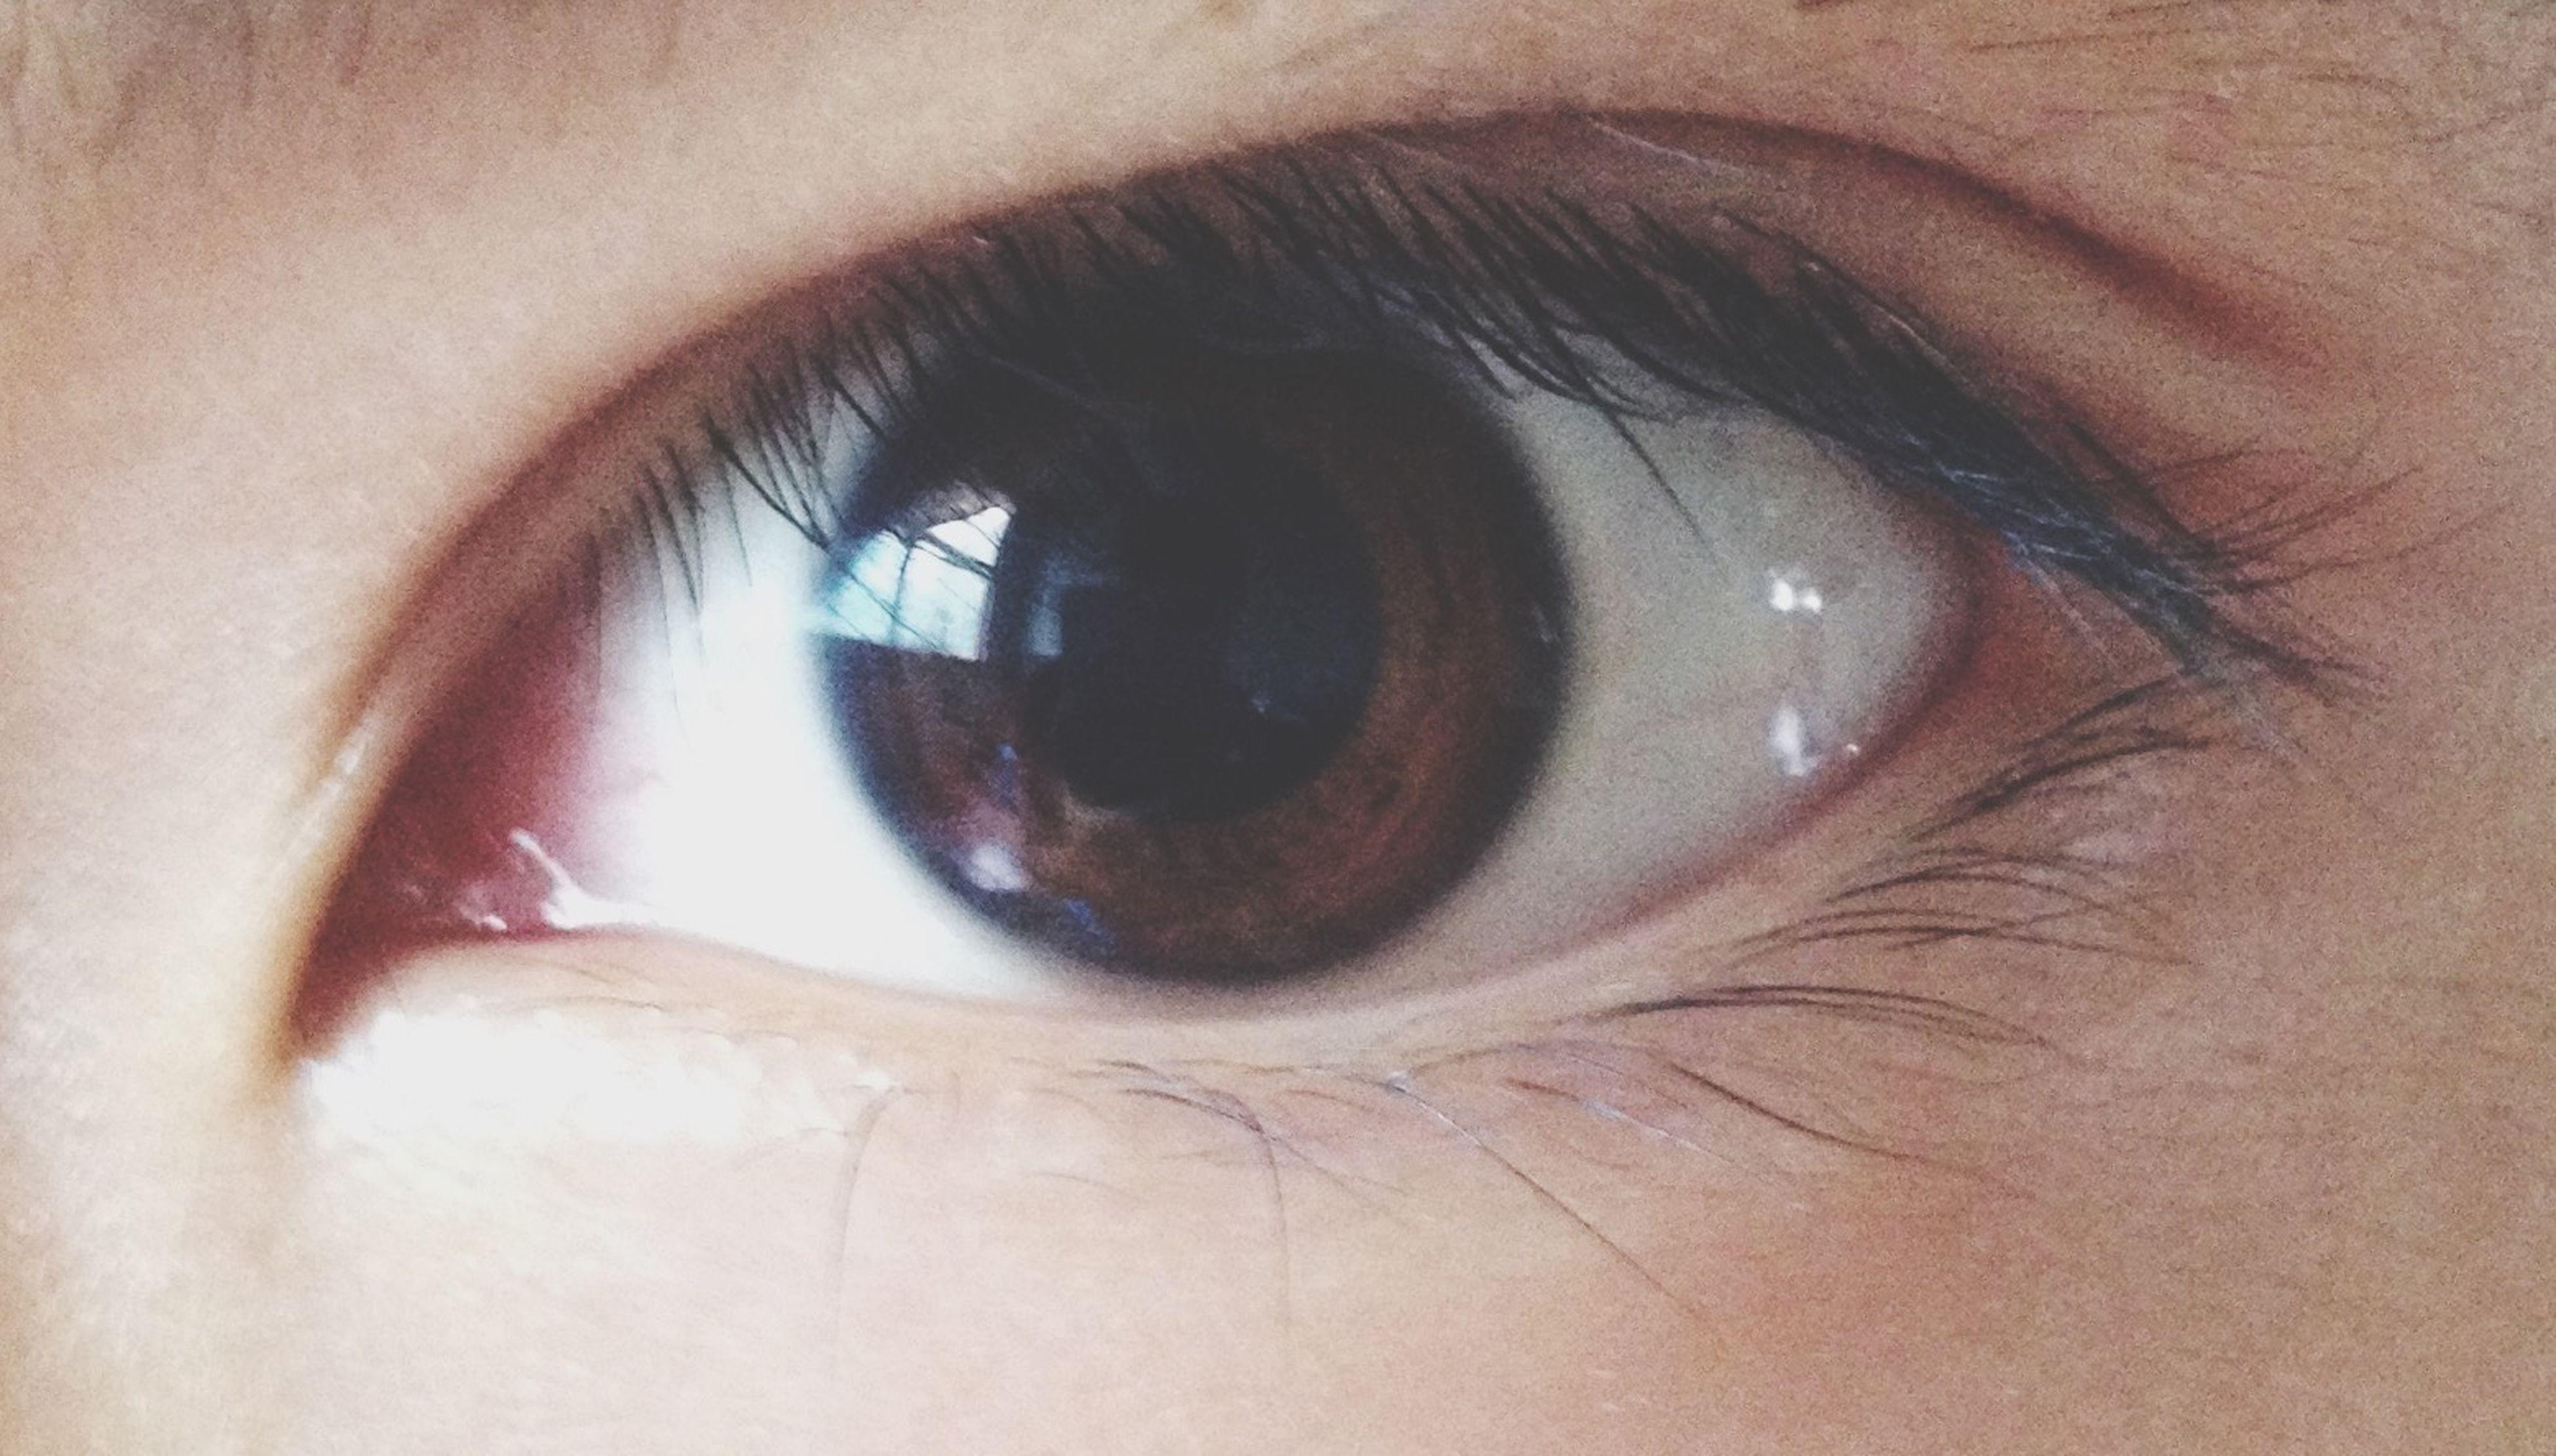 human eye, eyelash, close-up, eyesight, part of, sensory perception, human skin, lifestyles, person, human face, eyeball, extreme close-up, unrecognizable person, iris - eye, looking at camera, indoors, portrait